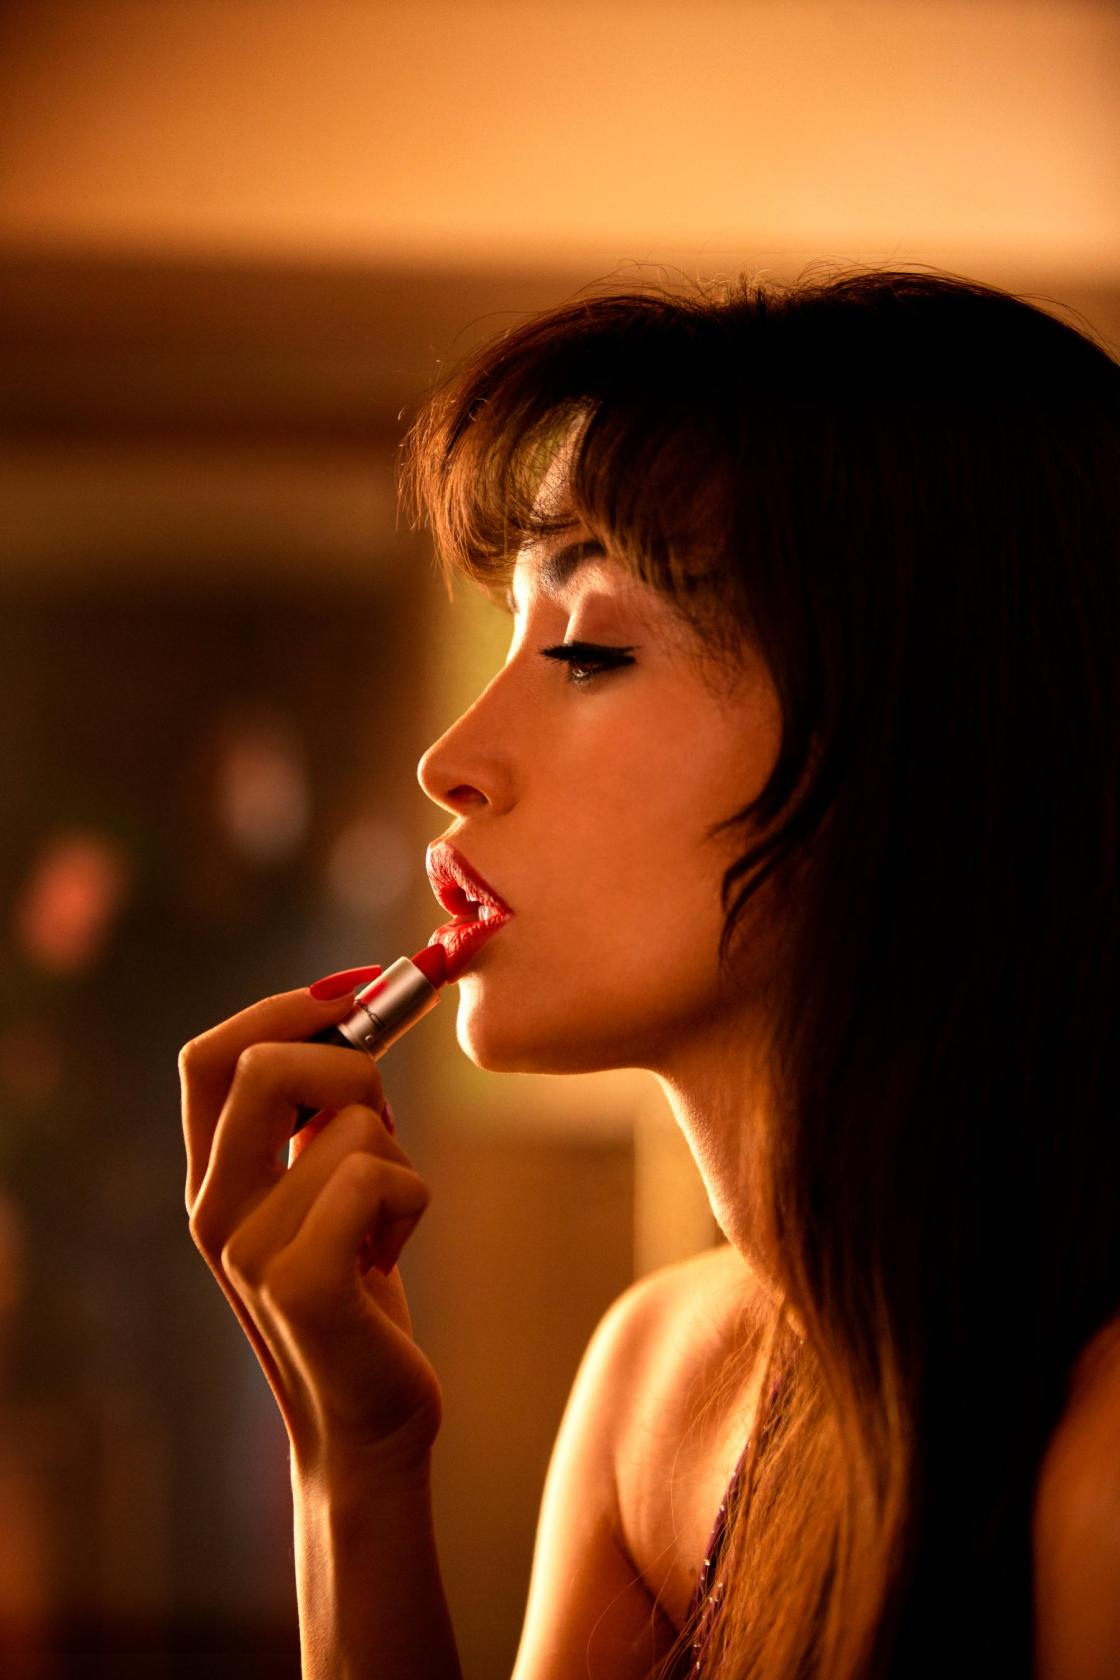 'Selena: The Series' will debut in December